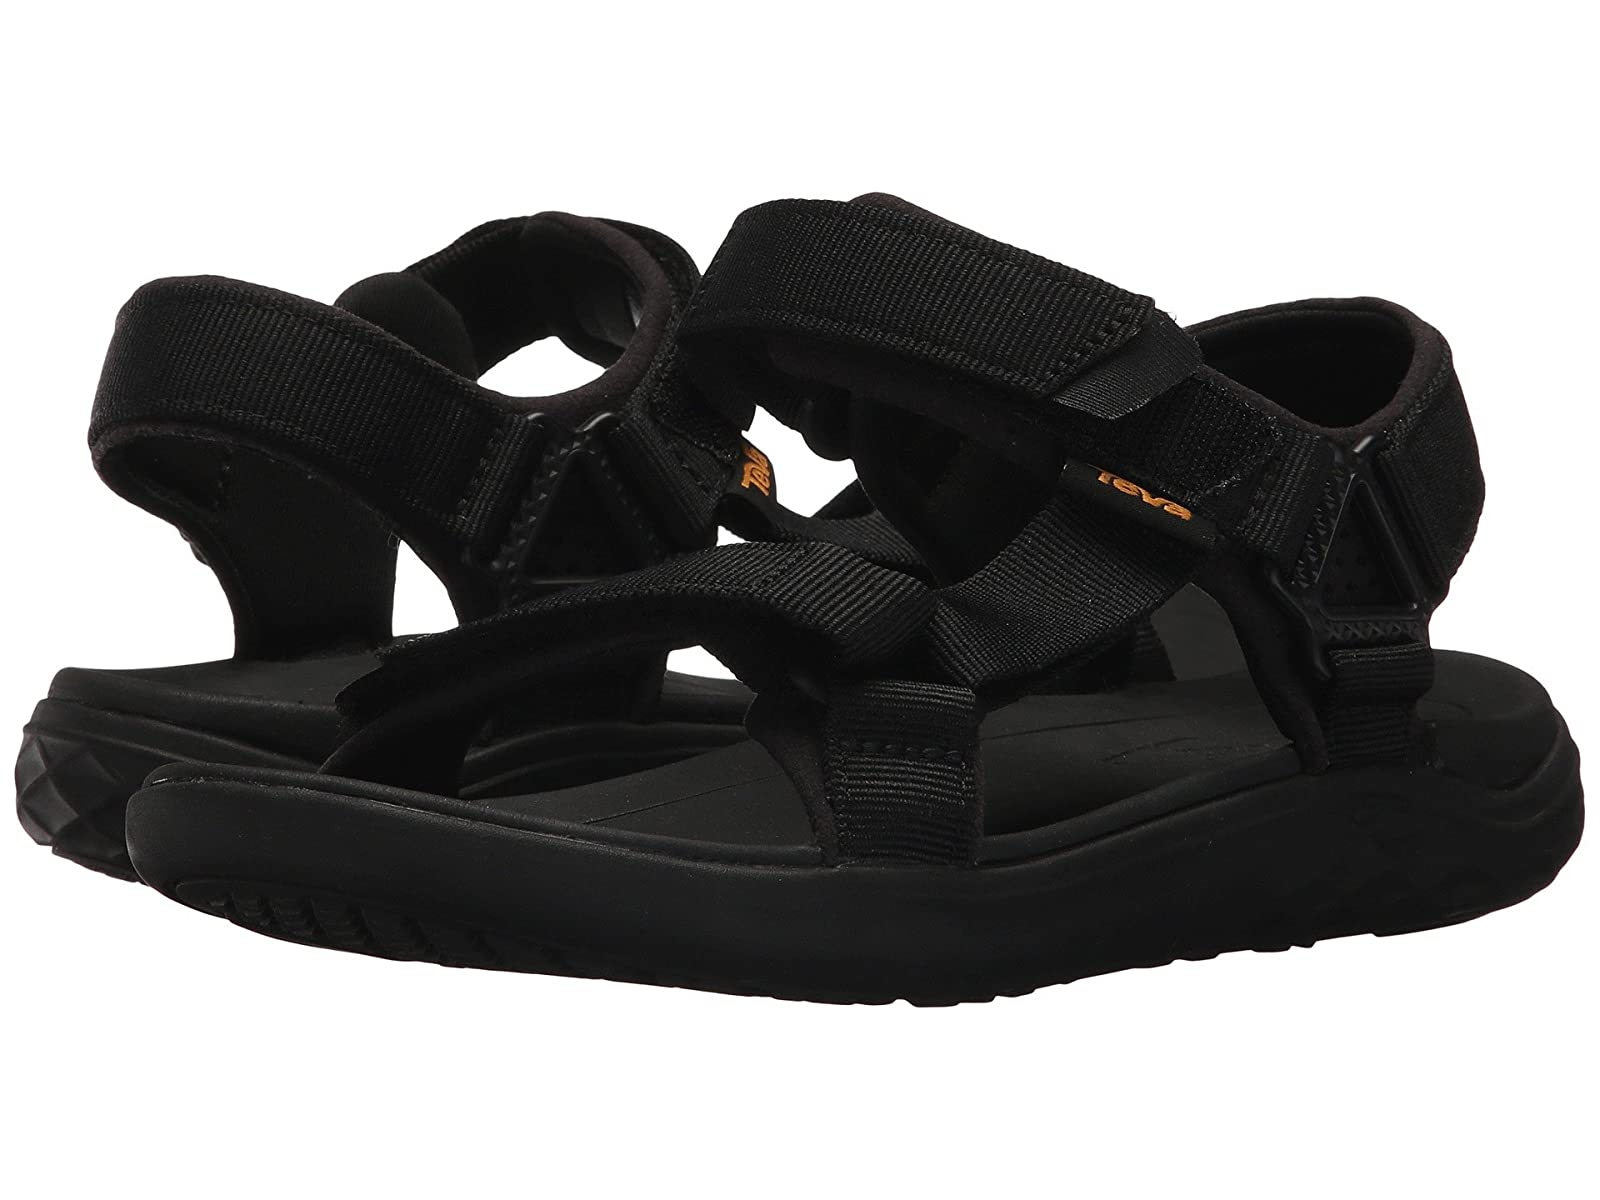 Teva Terra-Float 2 UniversalAtmospheric grades have affordable shoes